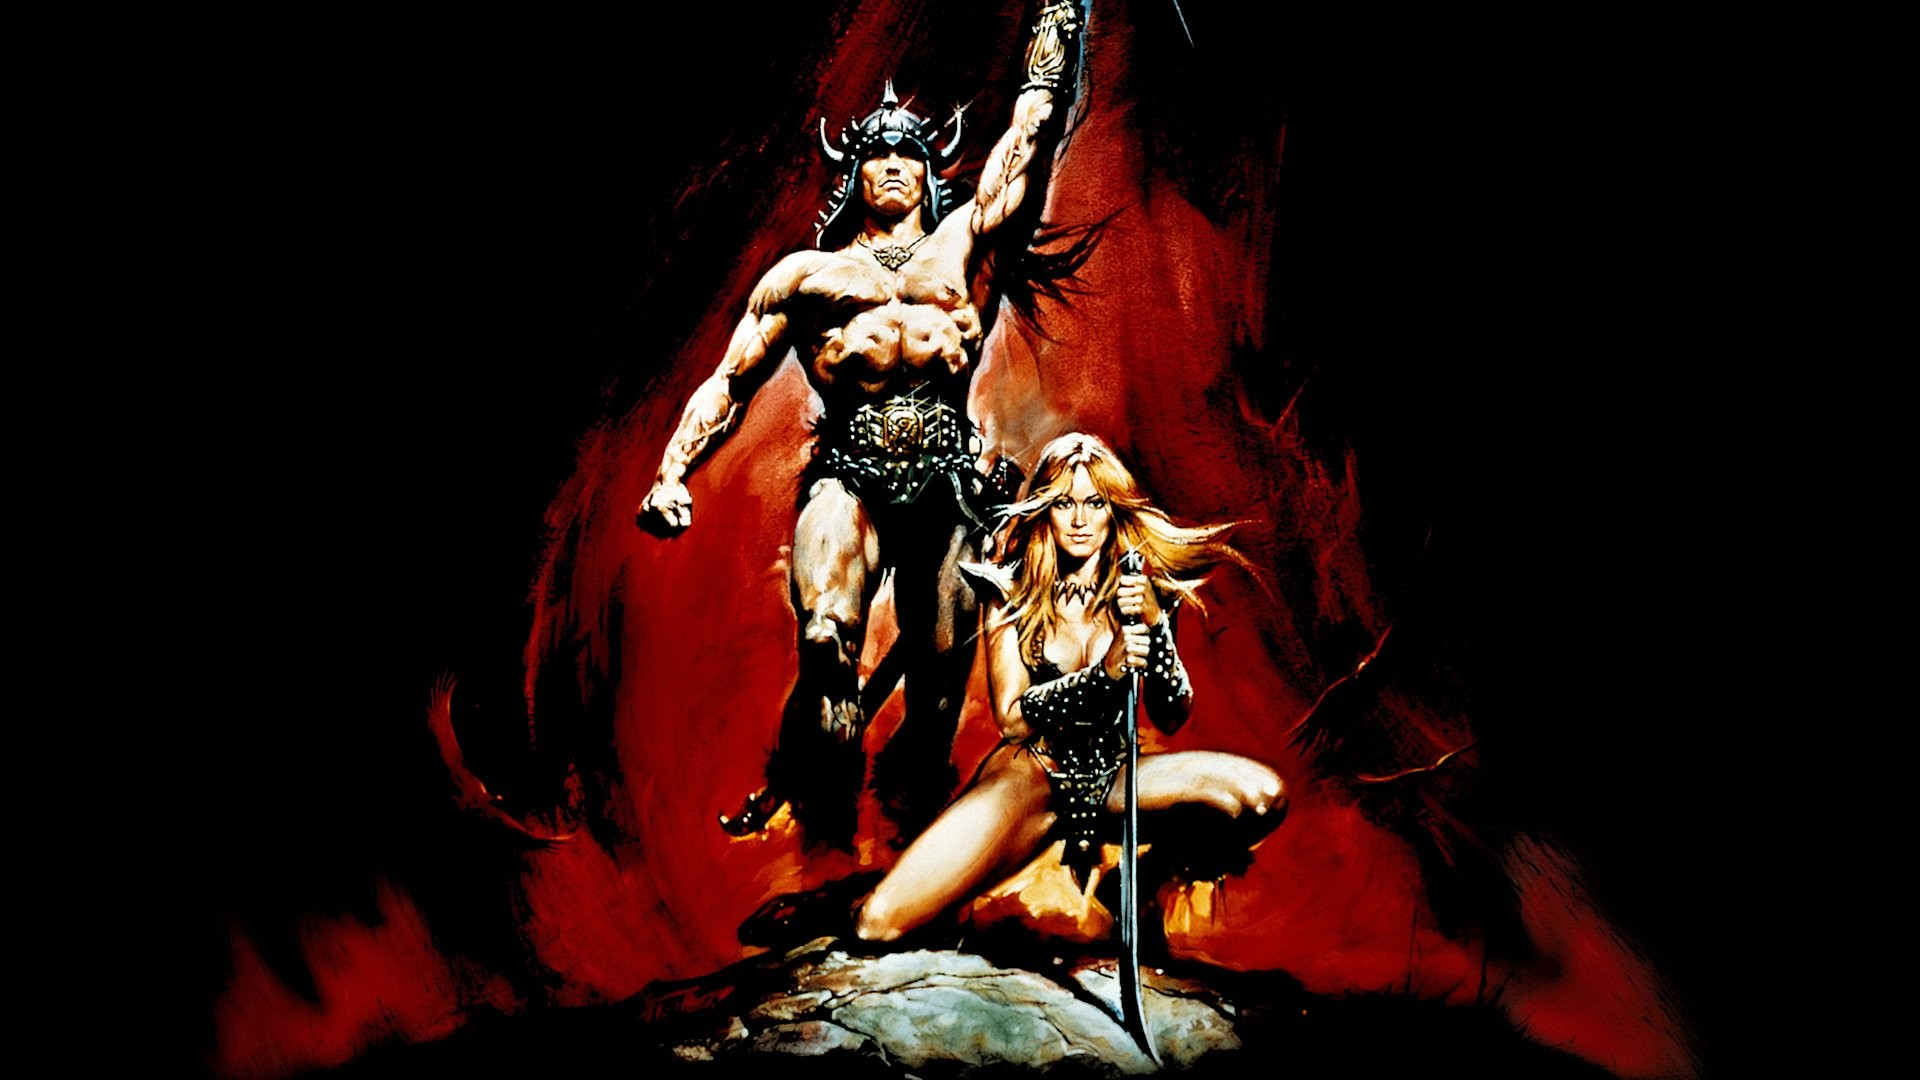 conan the barbarian hd wallpaper